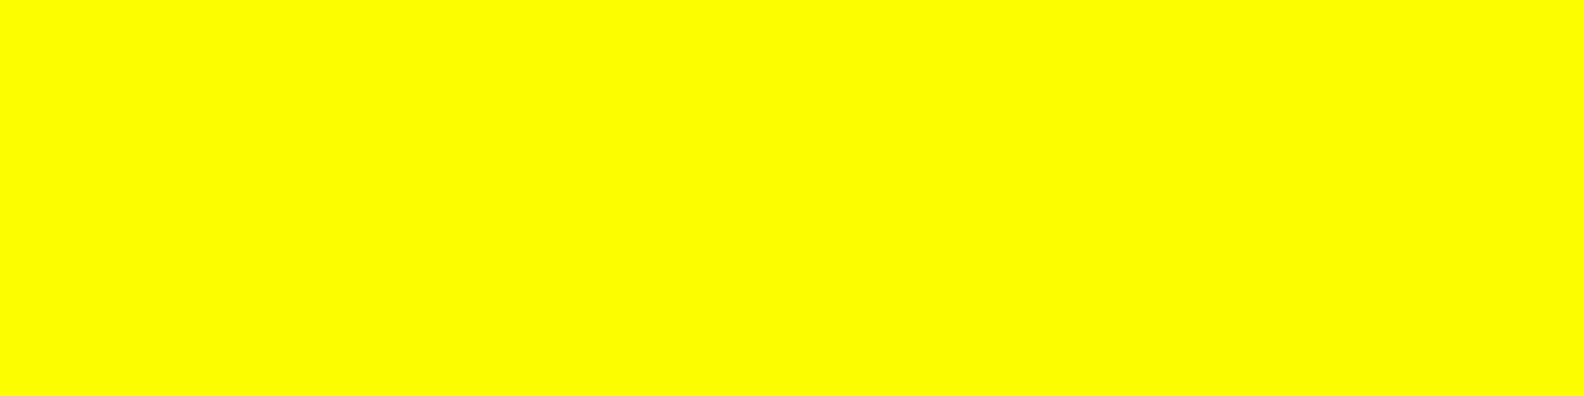 1584x396 Lemon Glacier Solid Color Background